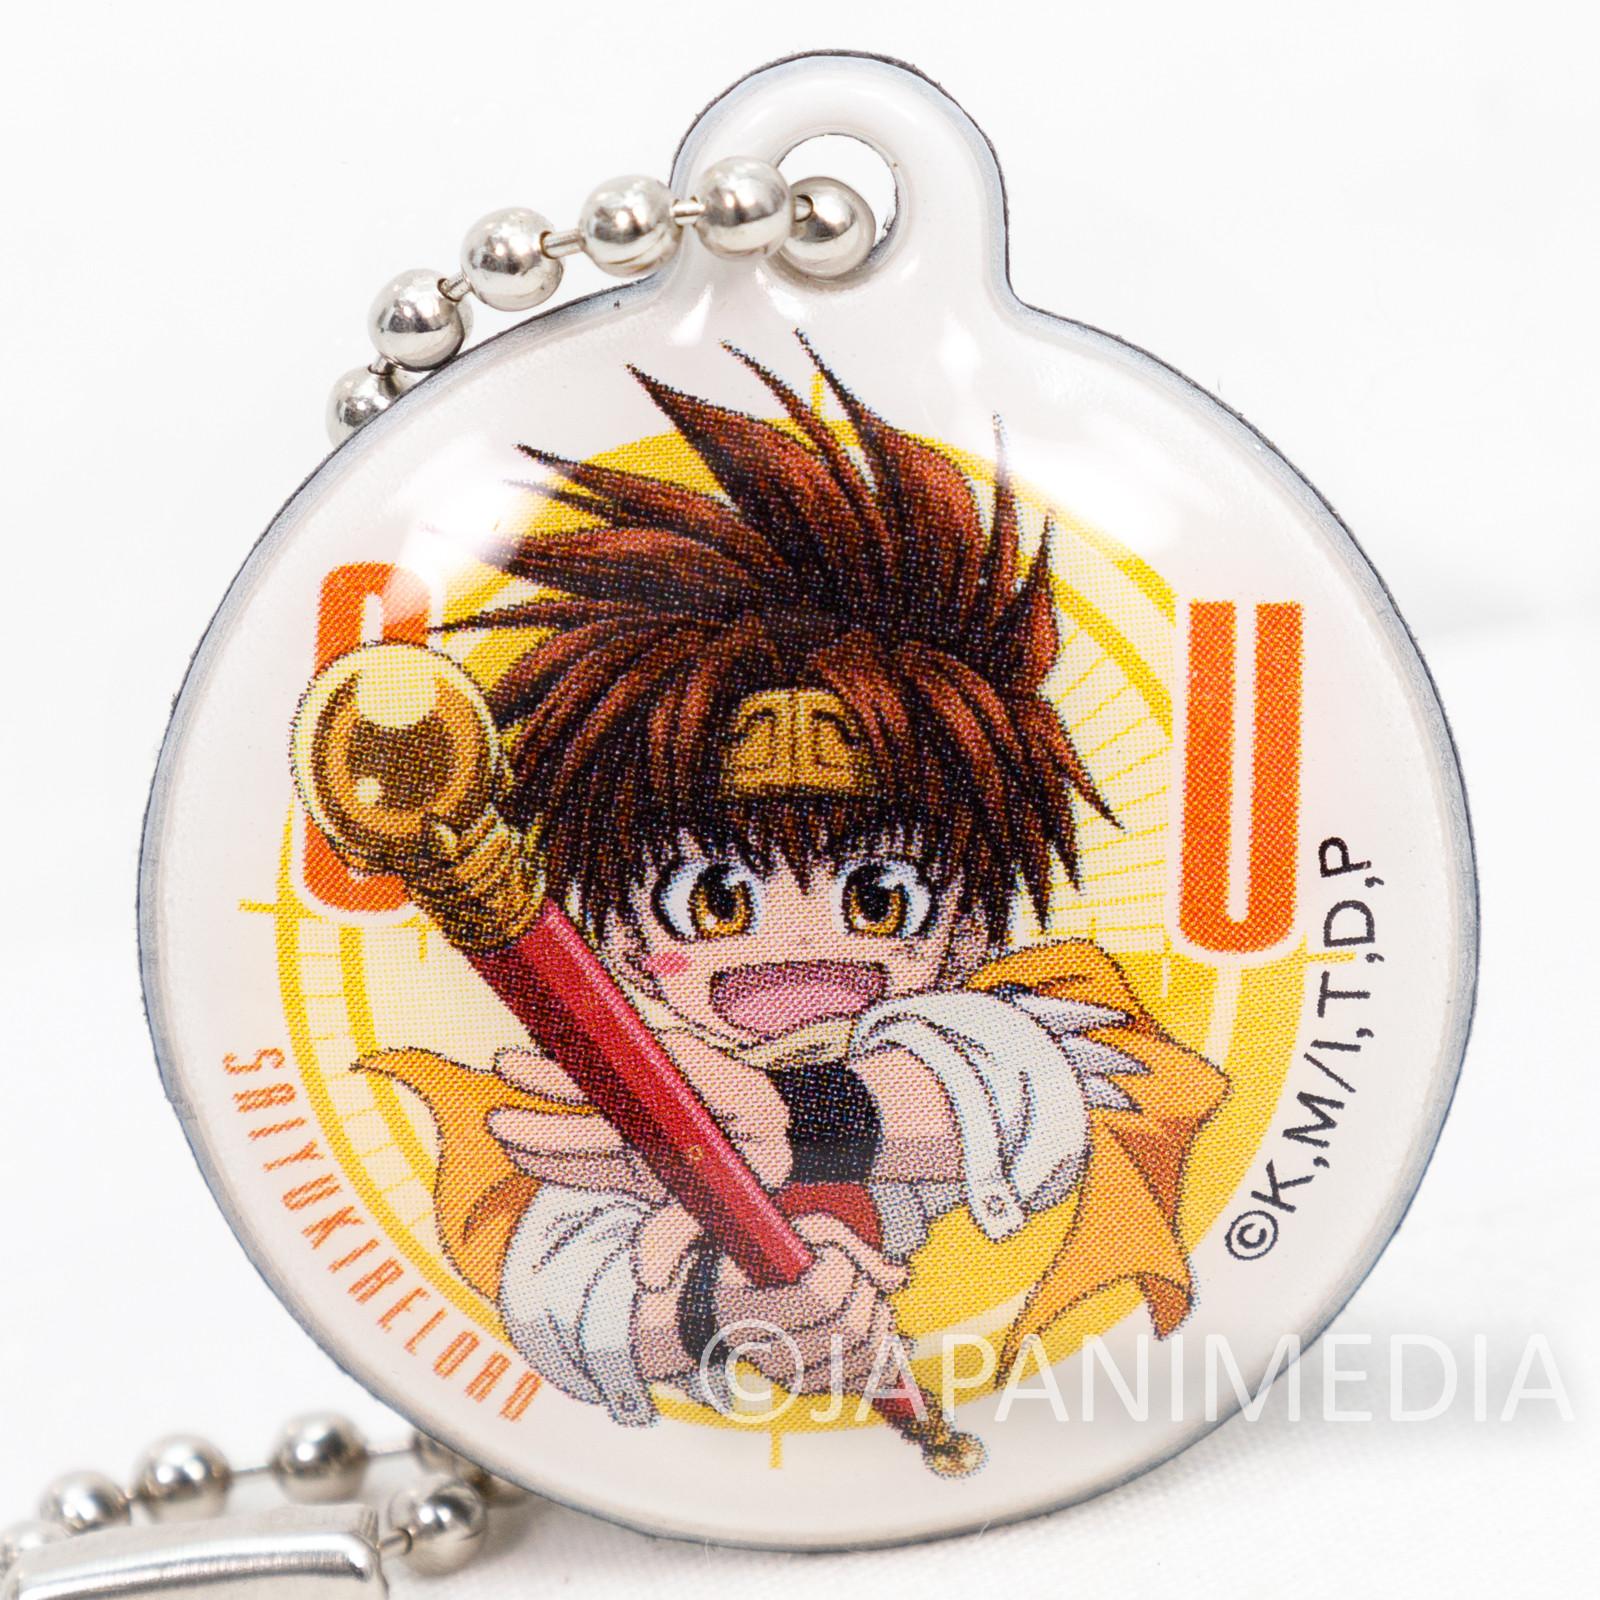 Gensomaden SAIYUKI Son Goku Screen Cleaner Mascot w/Ballchain